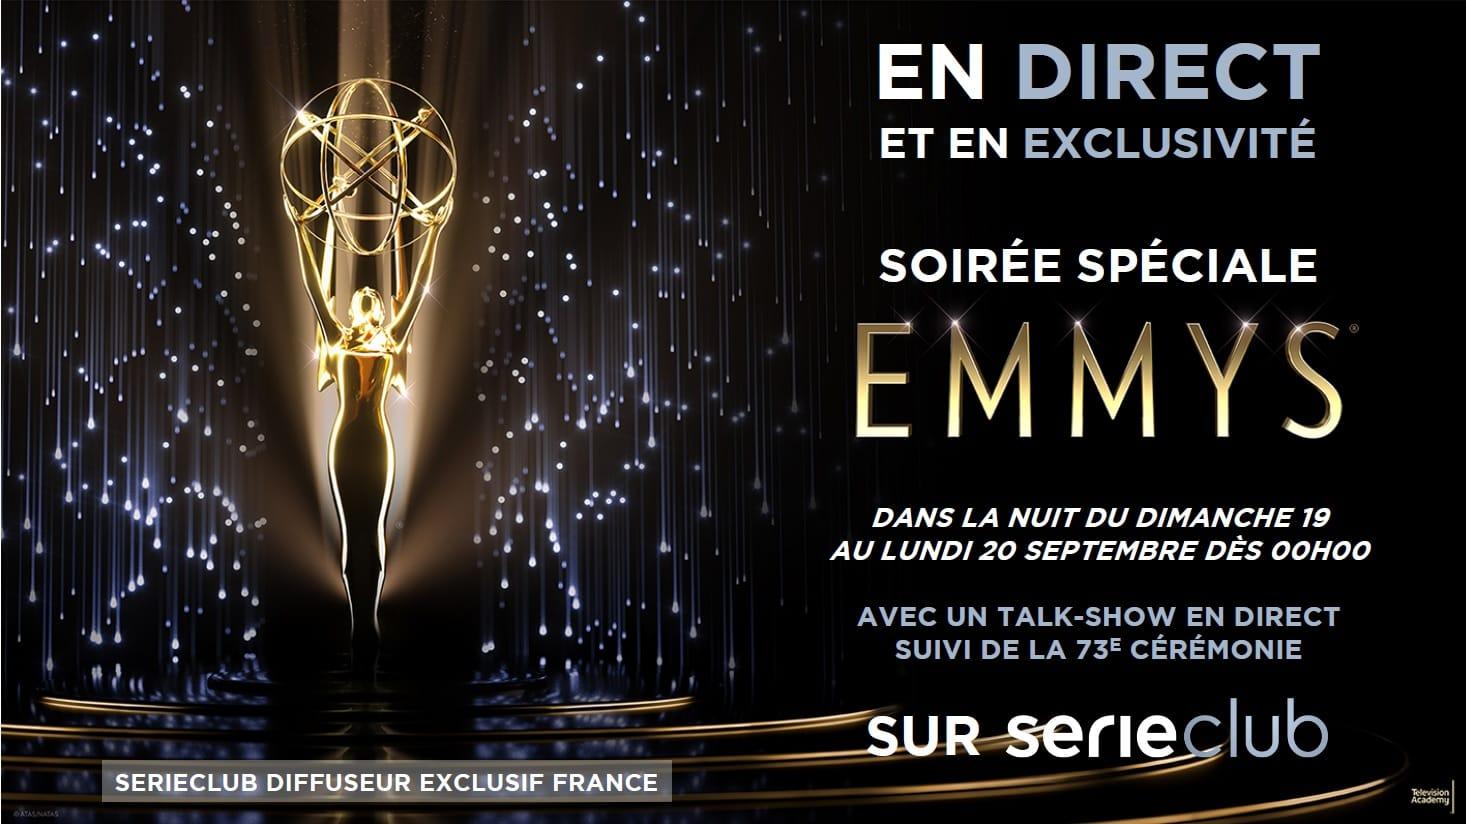 Emmy Awards 2021 affiche Serieclub cérémonie séries